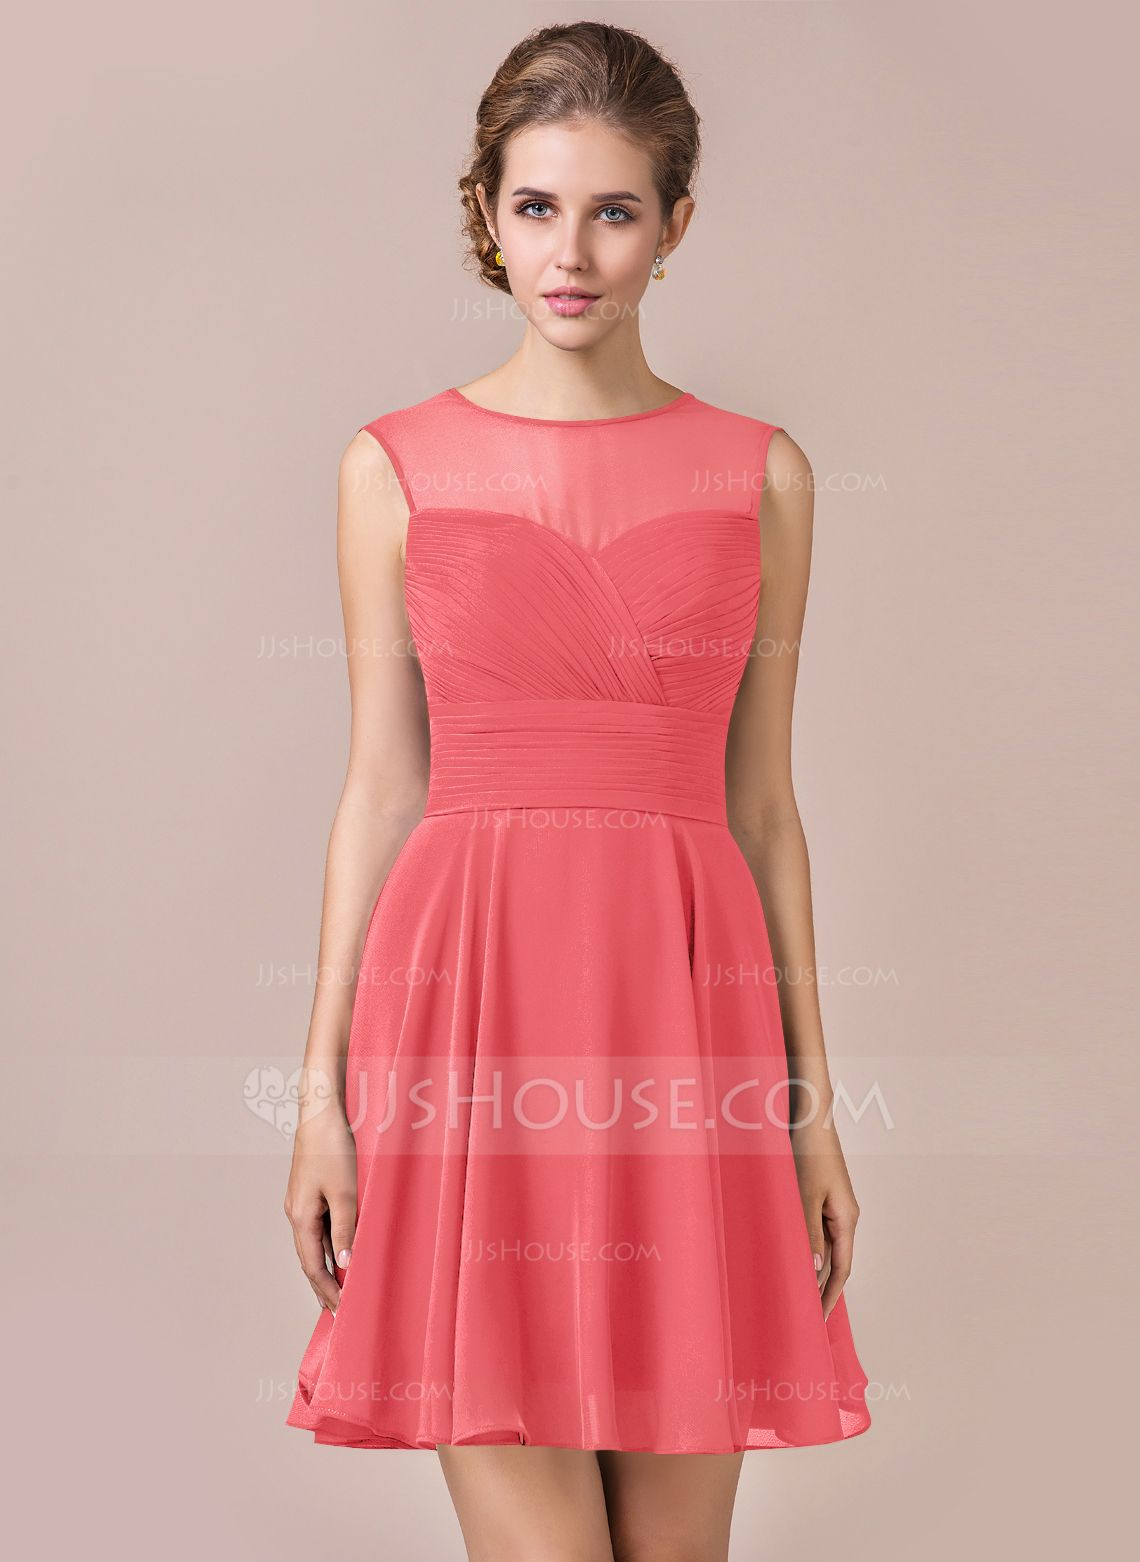 90d4f0b6dcd0 A-Line/Princess Scoop Neck Knee-Length Chiffon Bridesmaid Dress With Ruffle  (007063002) - JJsHouse